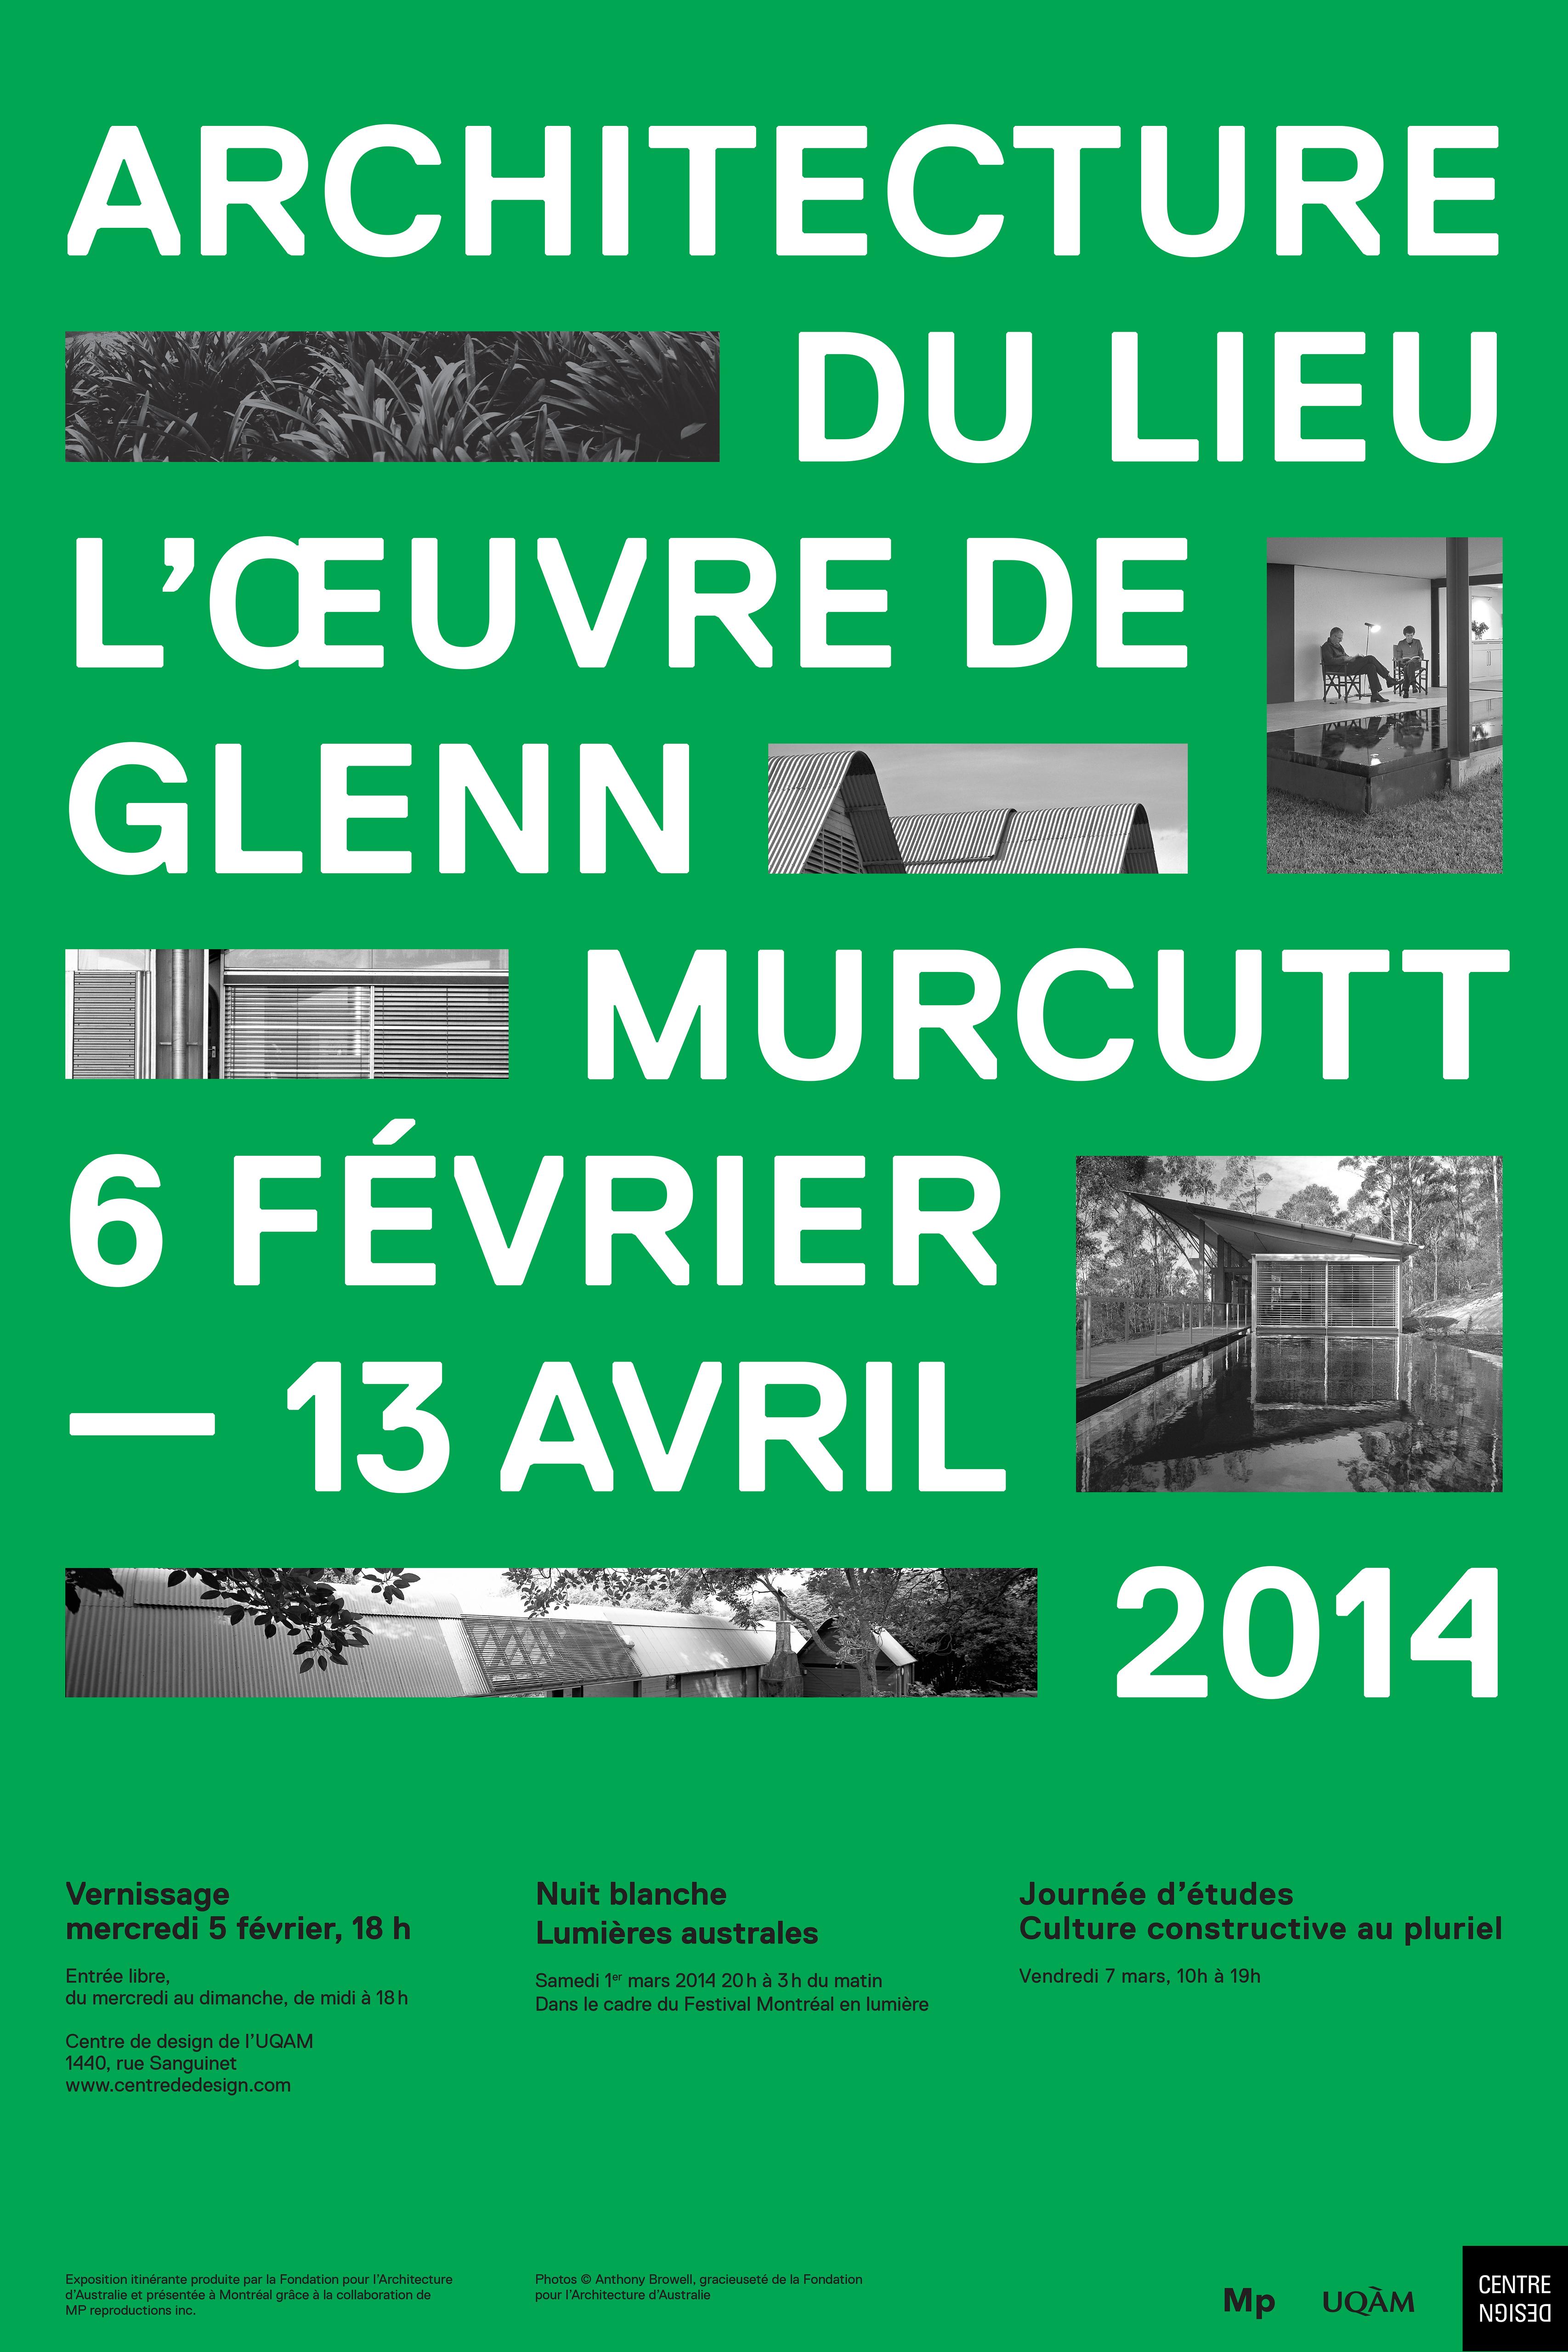 2014 - Exposition - Architecture du lieu l'oeuvre de Glenn Murcutt © Magali Rouleau-1